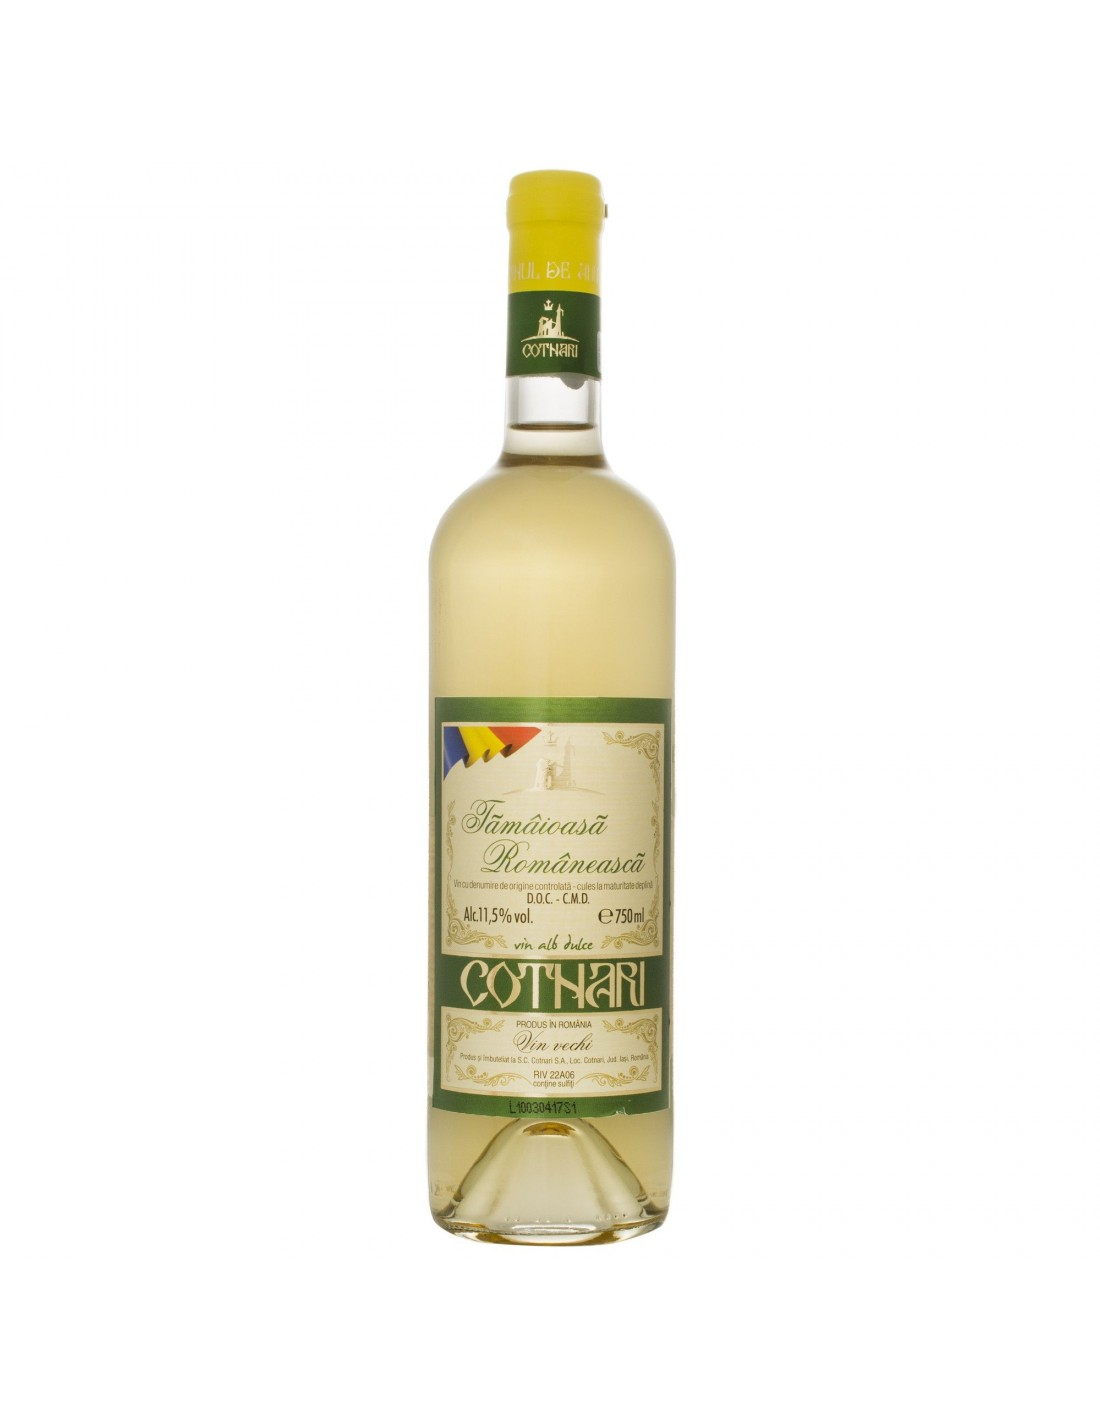 Vin alb dulce, Cotnari Tamaioasa Romaneasca, 0.75L, 11.5% alc., Romania